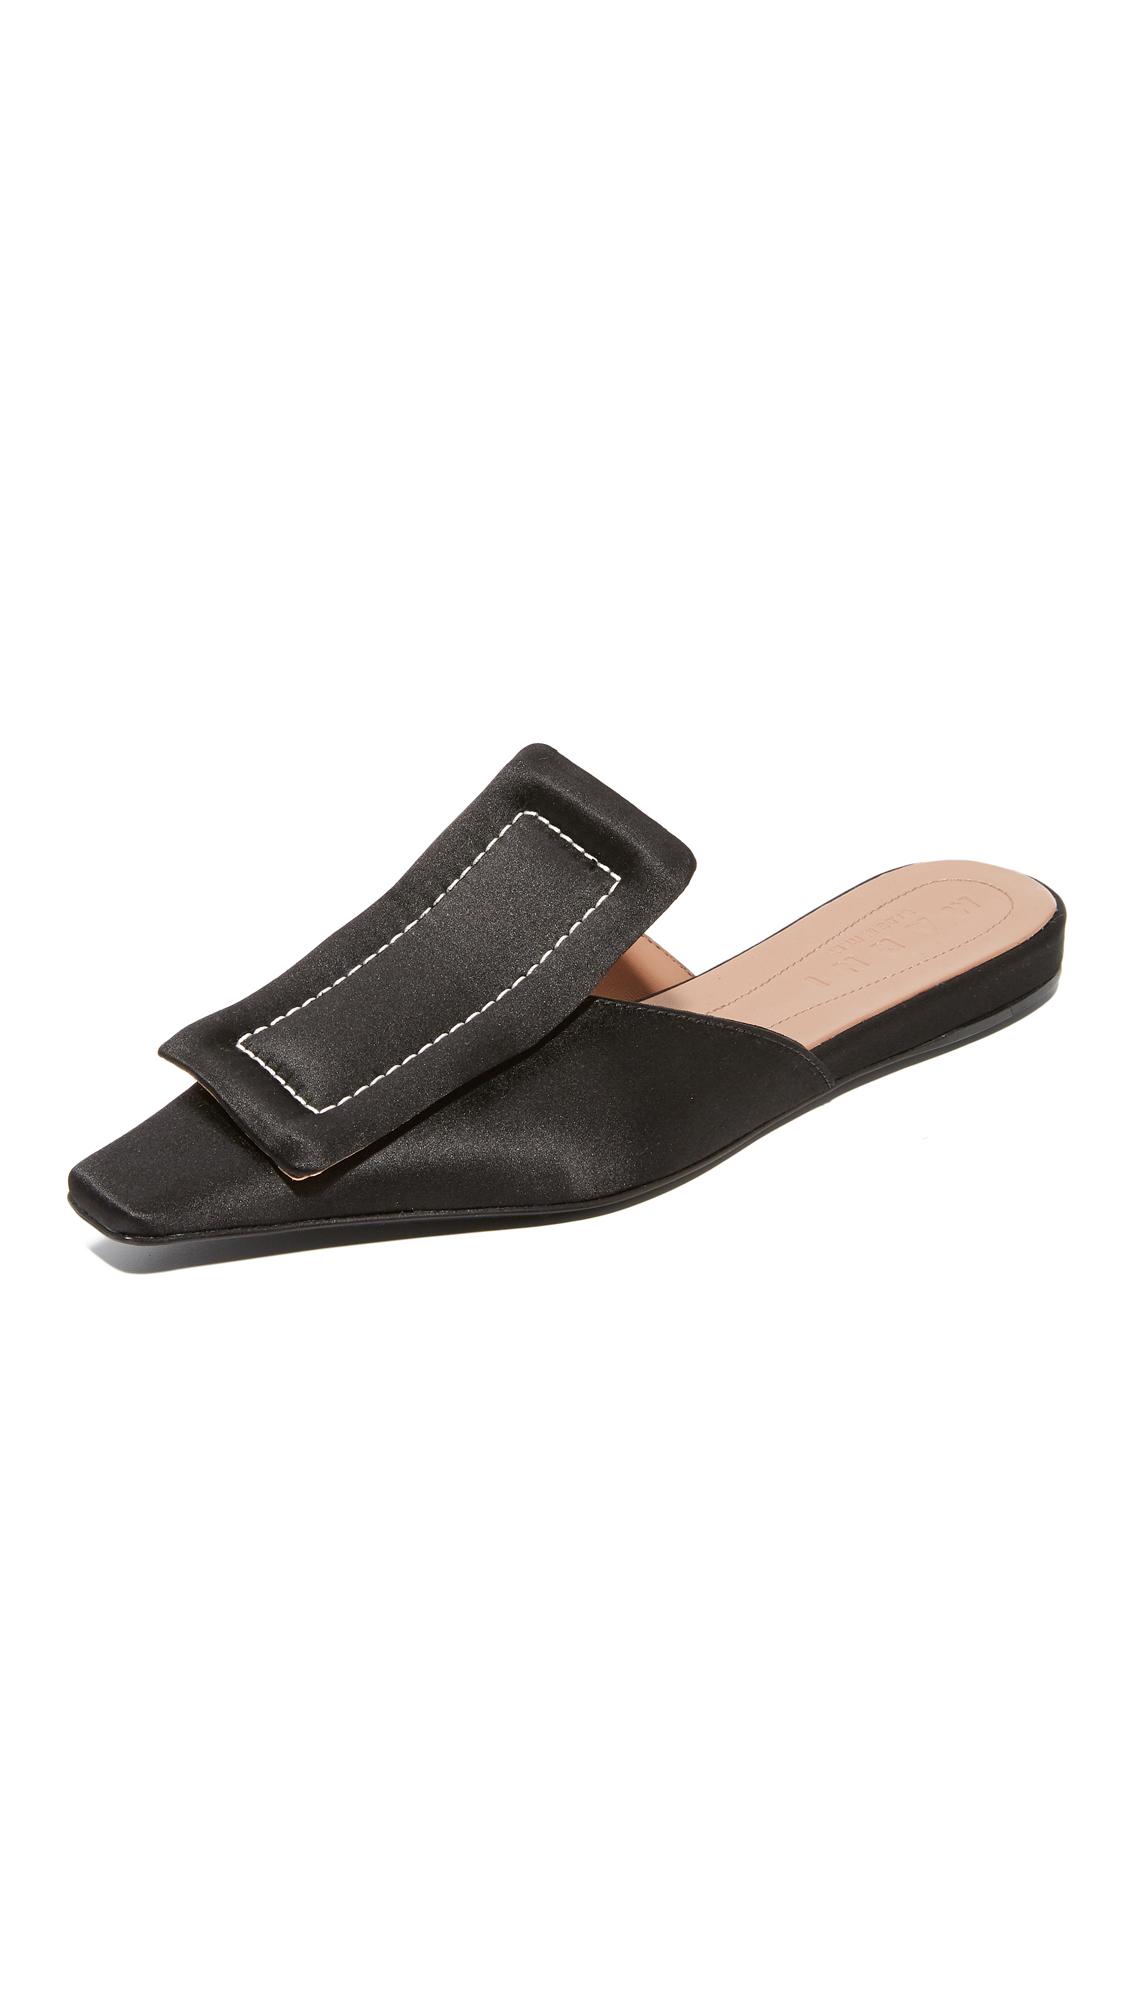 Marni Sabot Mules - Black